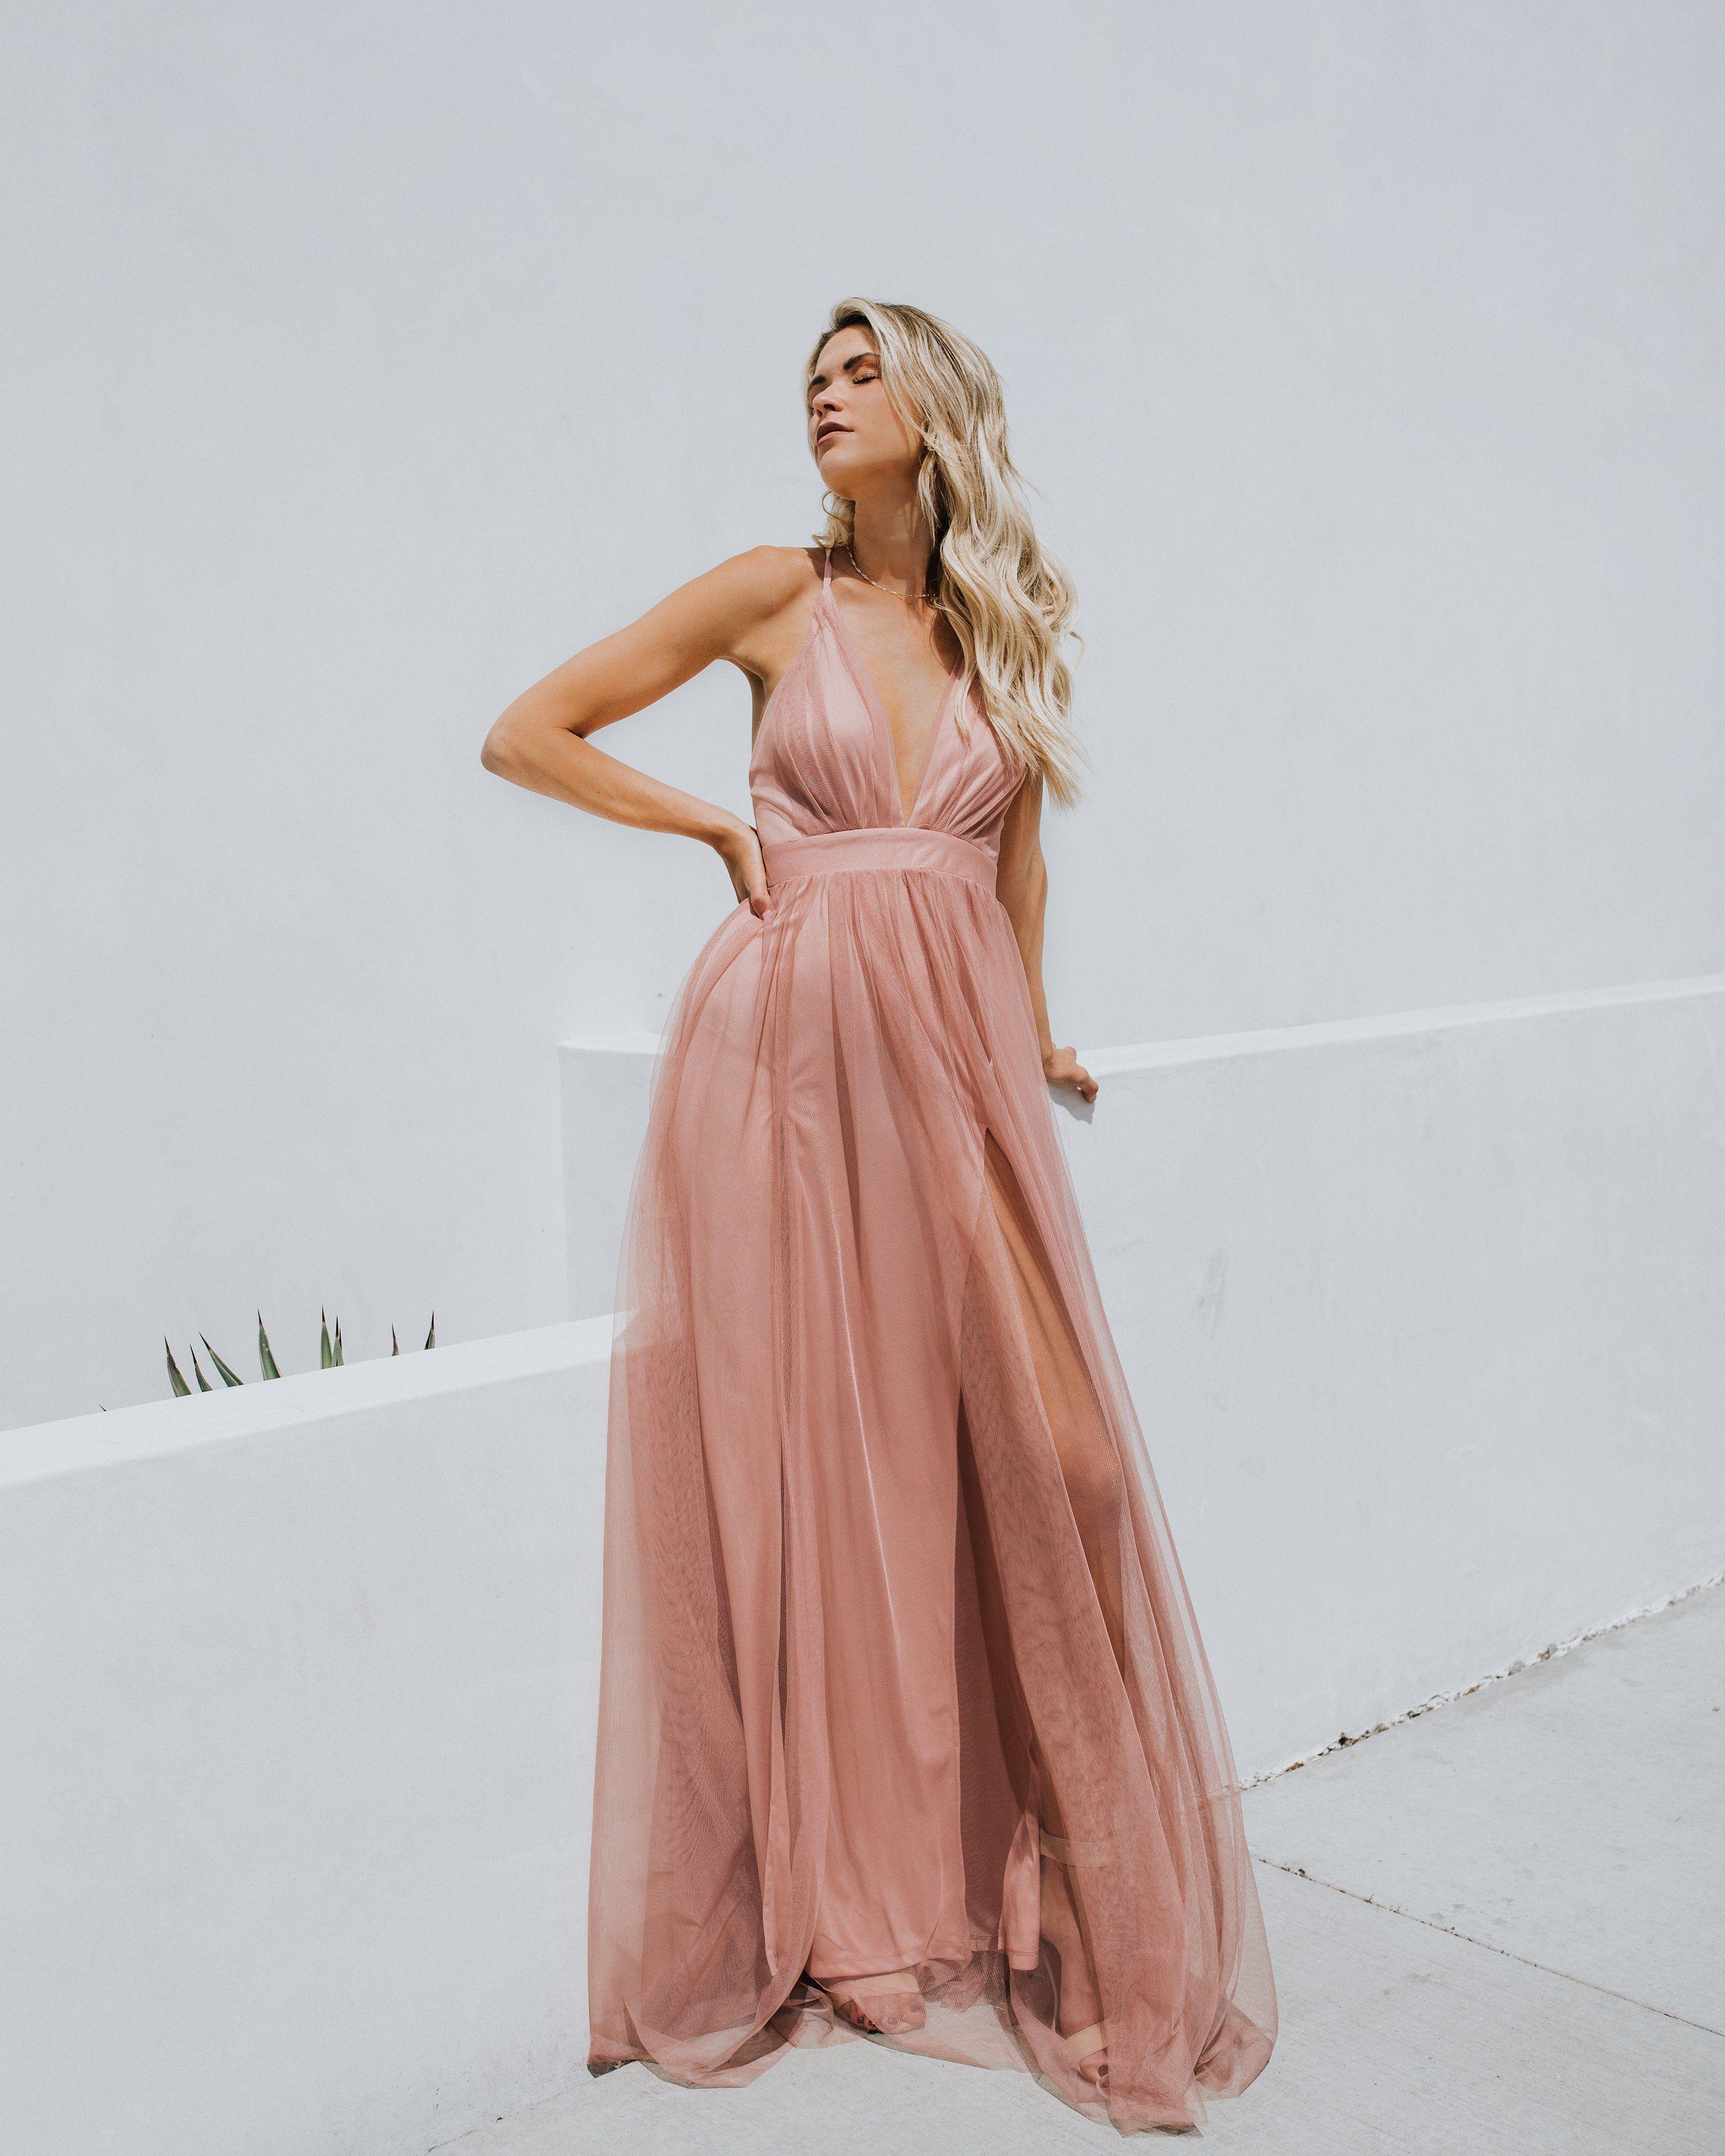 Petal Dust Maxi Dress Formal Wedding Guest Dress Blush Bridesmaid Dresses Wedding Guest Dress [ 3600 x 2880 Pixel ]